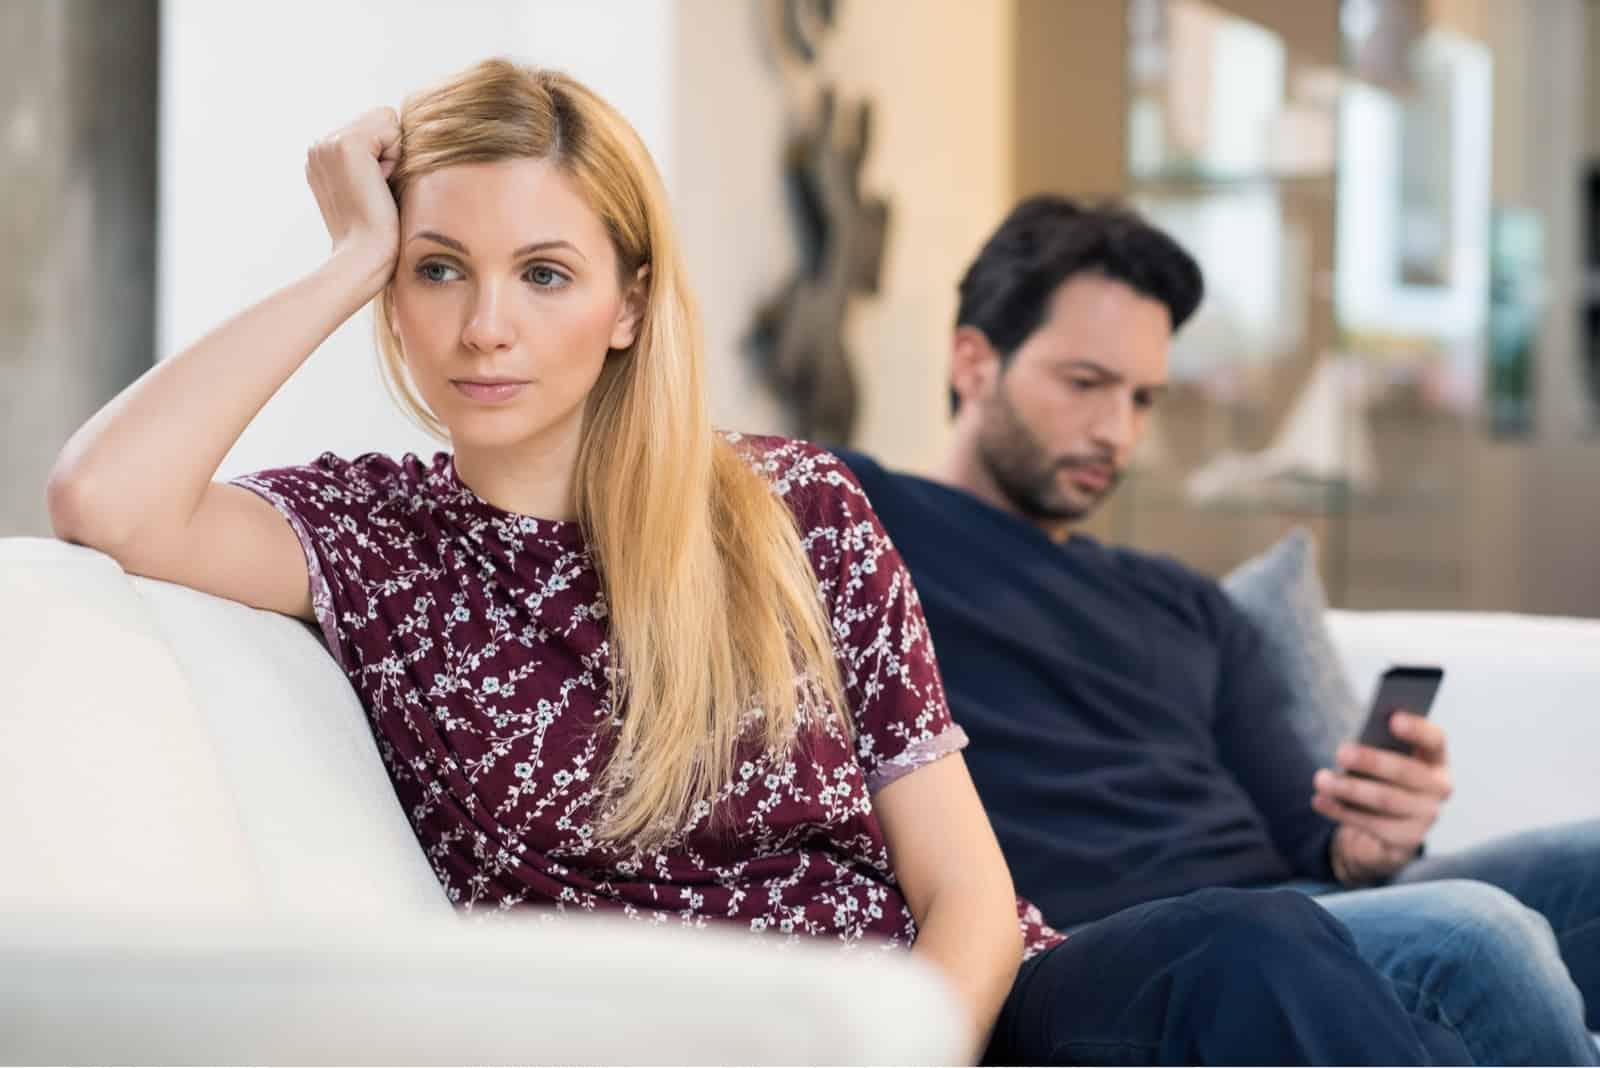 sad woman leaning on sofa while sitting near man